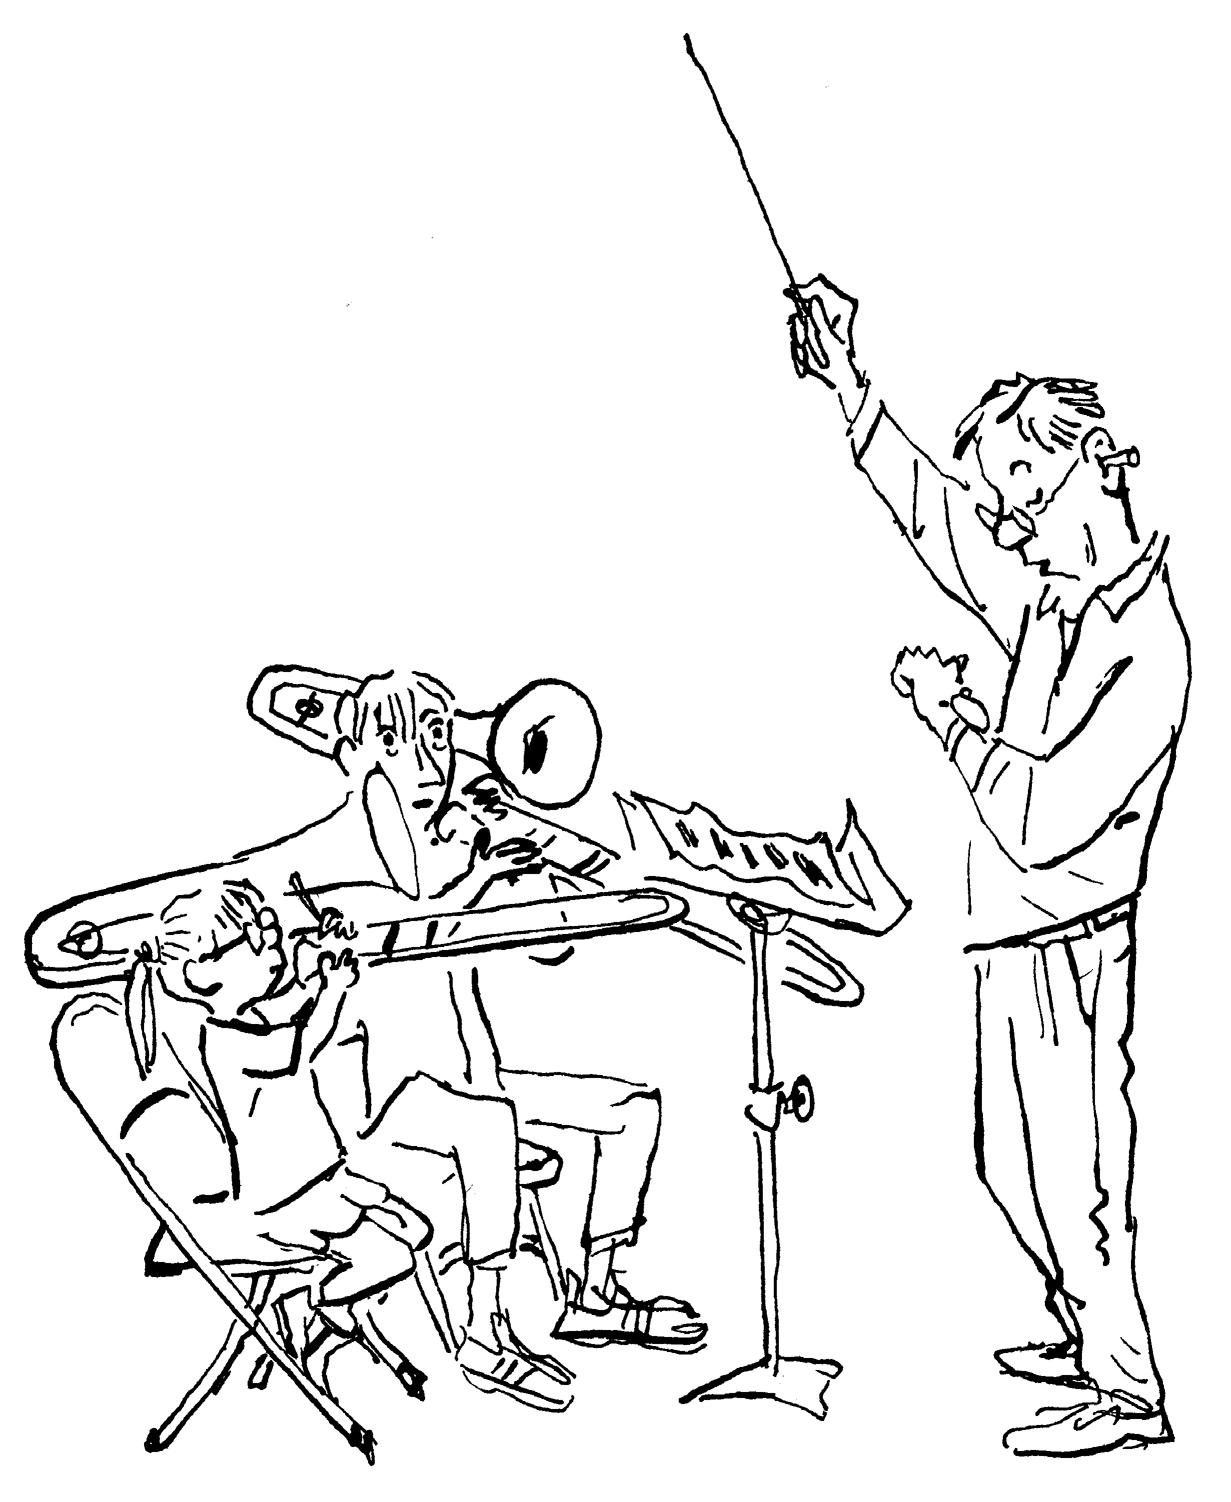 Caption That Cartoon | Children\'s Author David L. Harrison\'s Blog